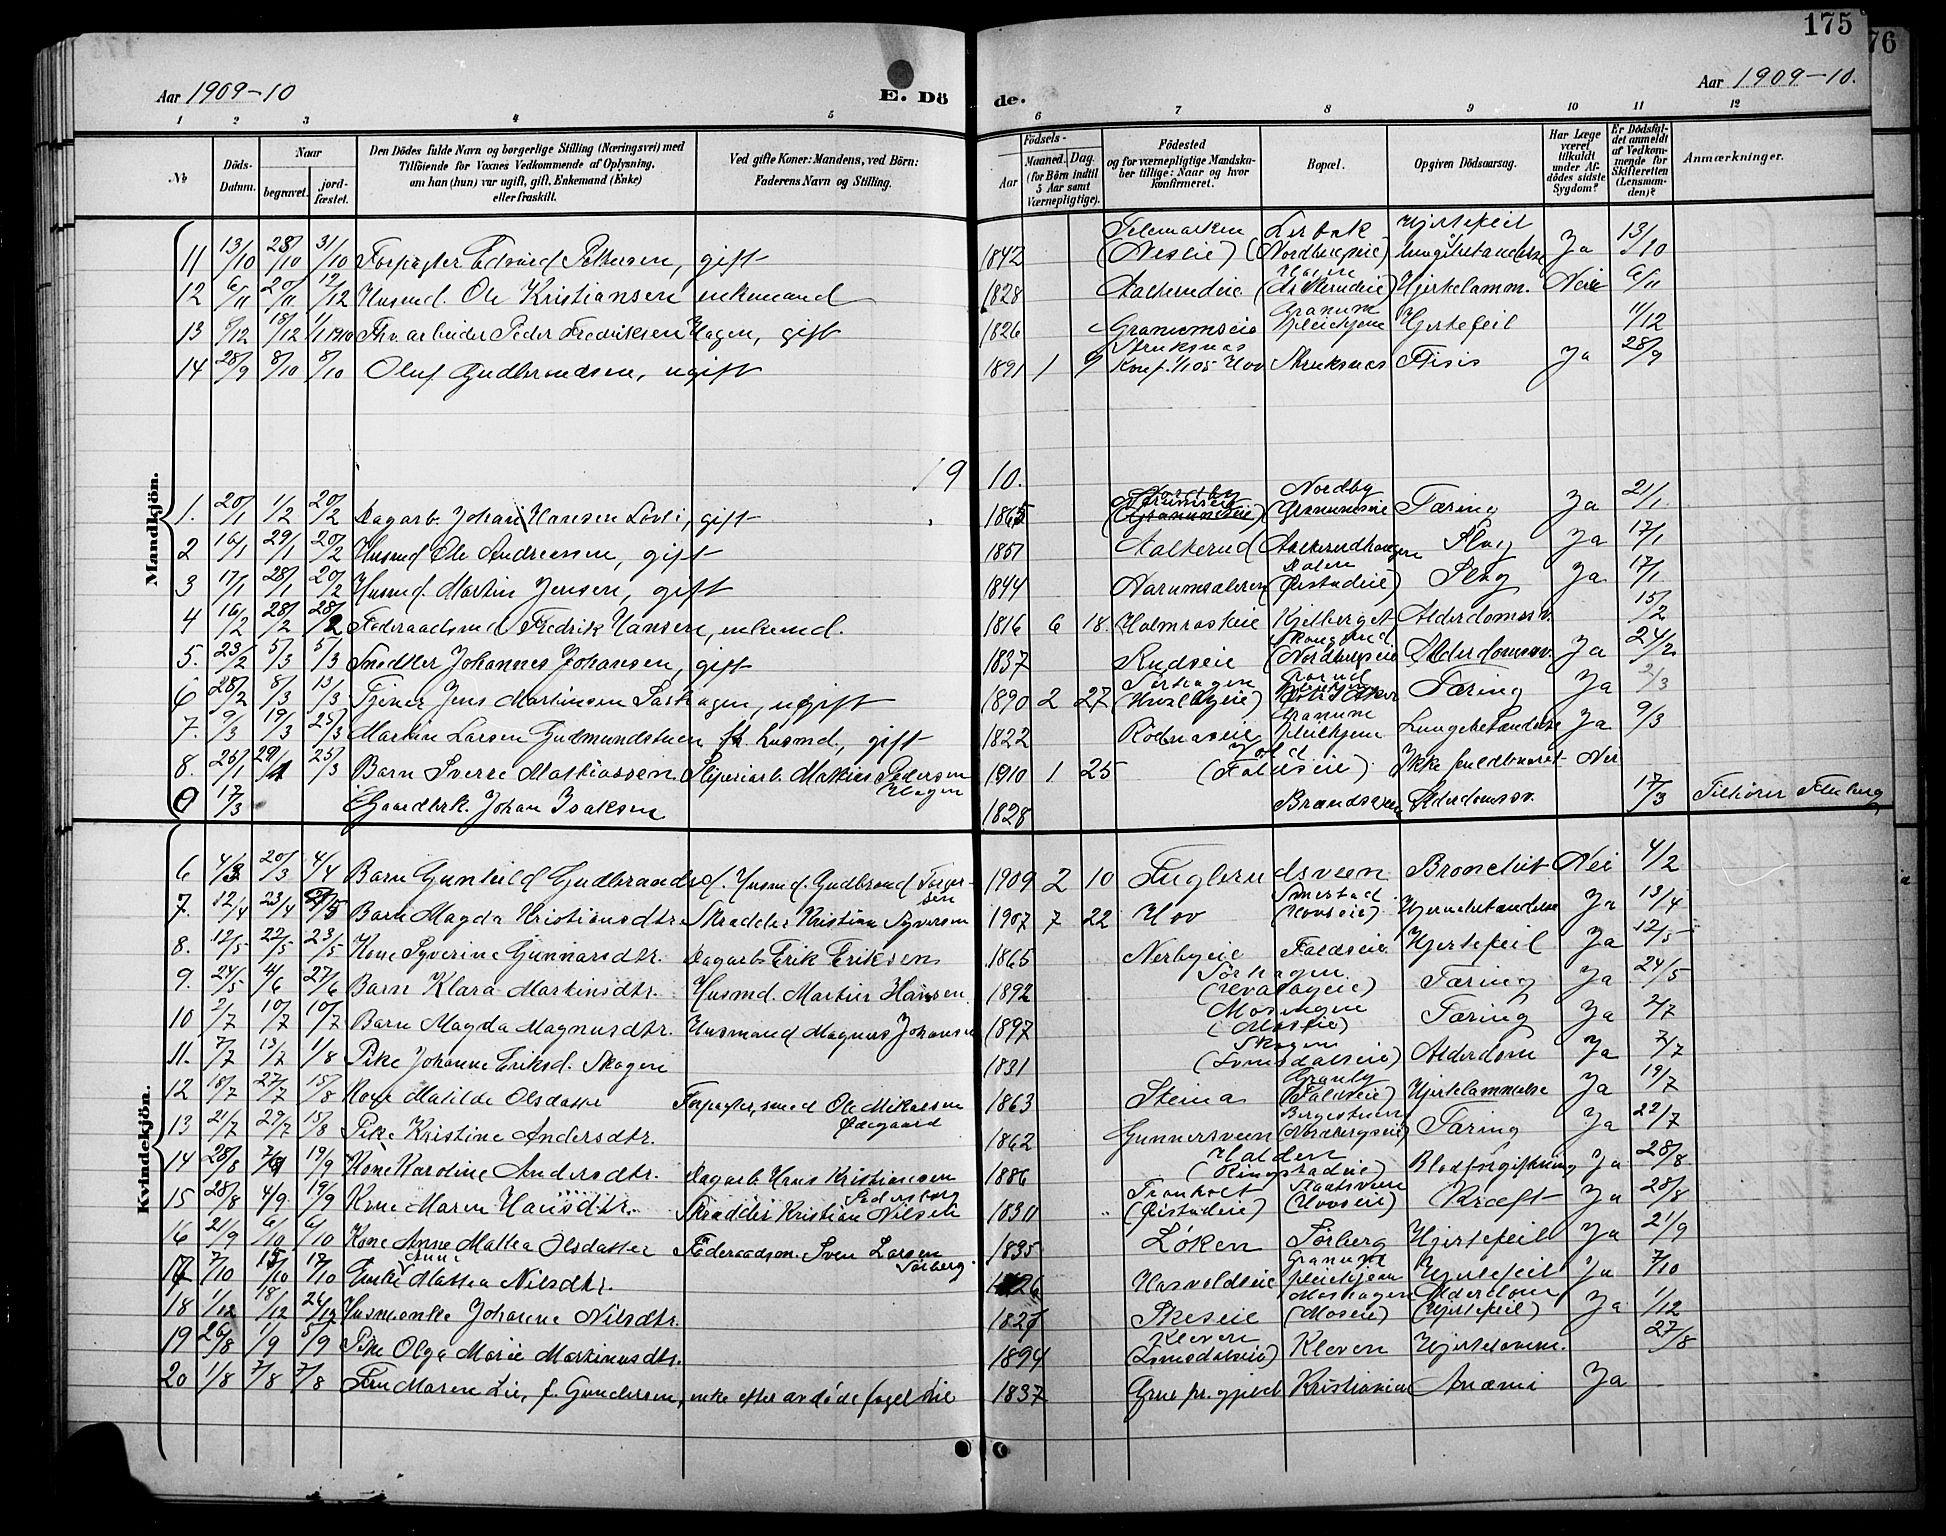 SAH, Søndre Land prestekontor, L/L0004: Klokkerbok nr. 4, 1901-1915, s. 175